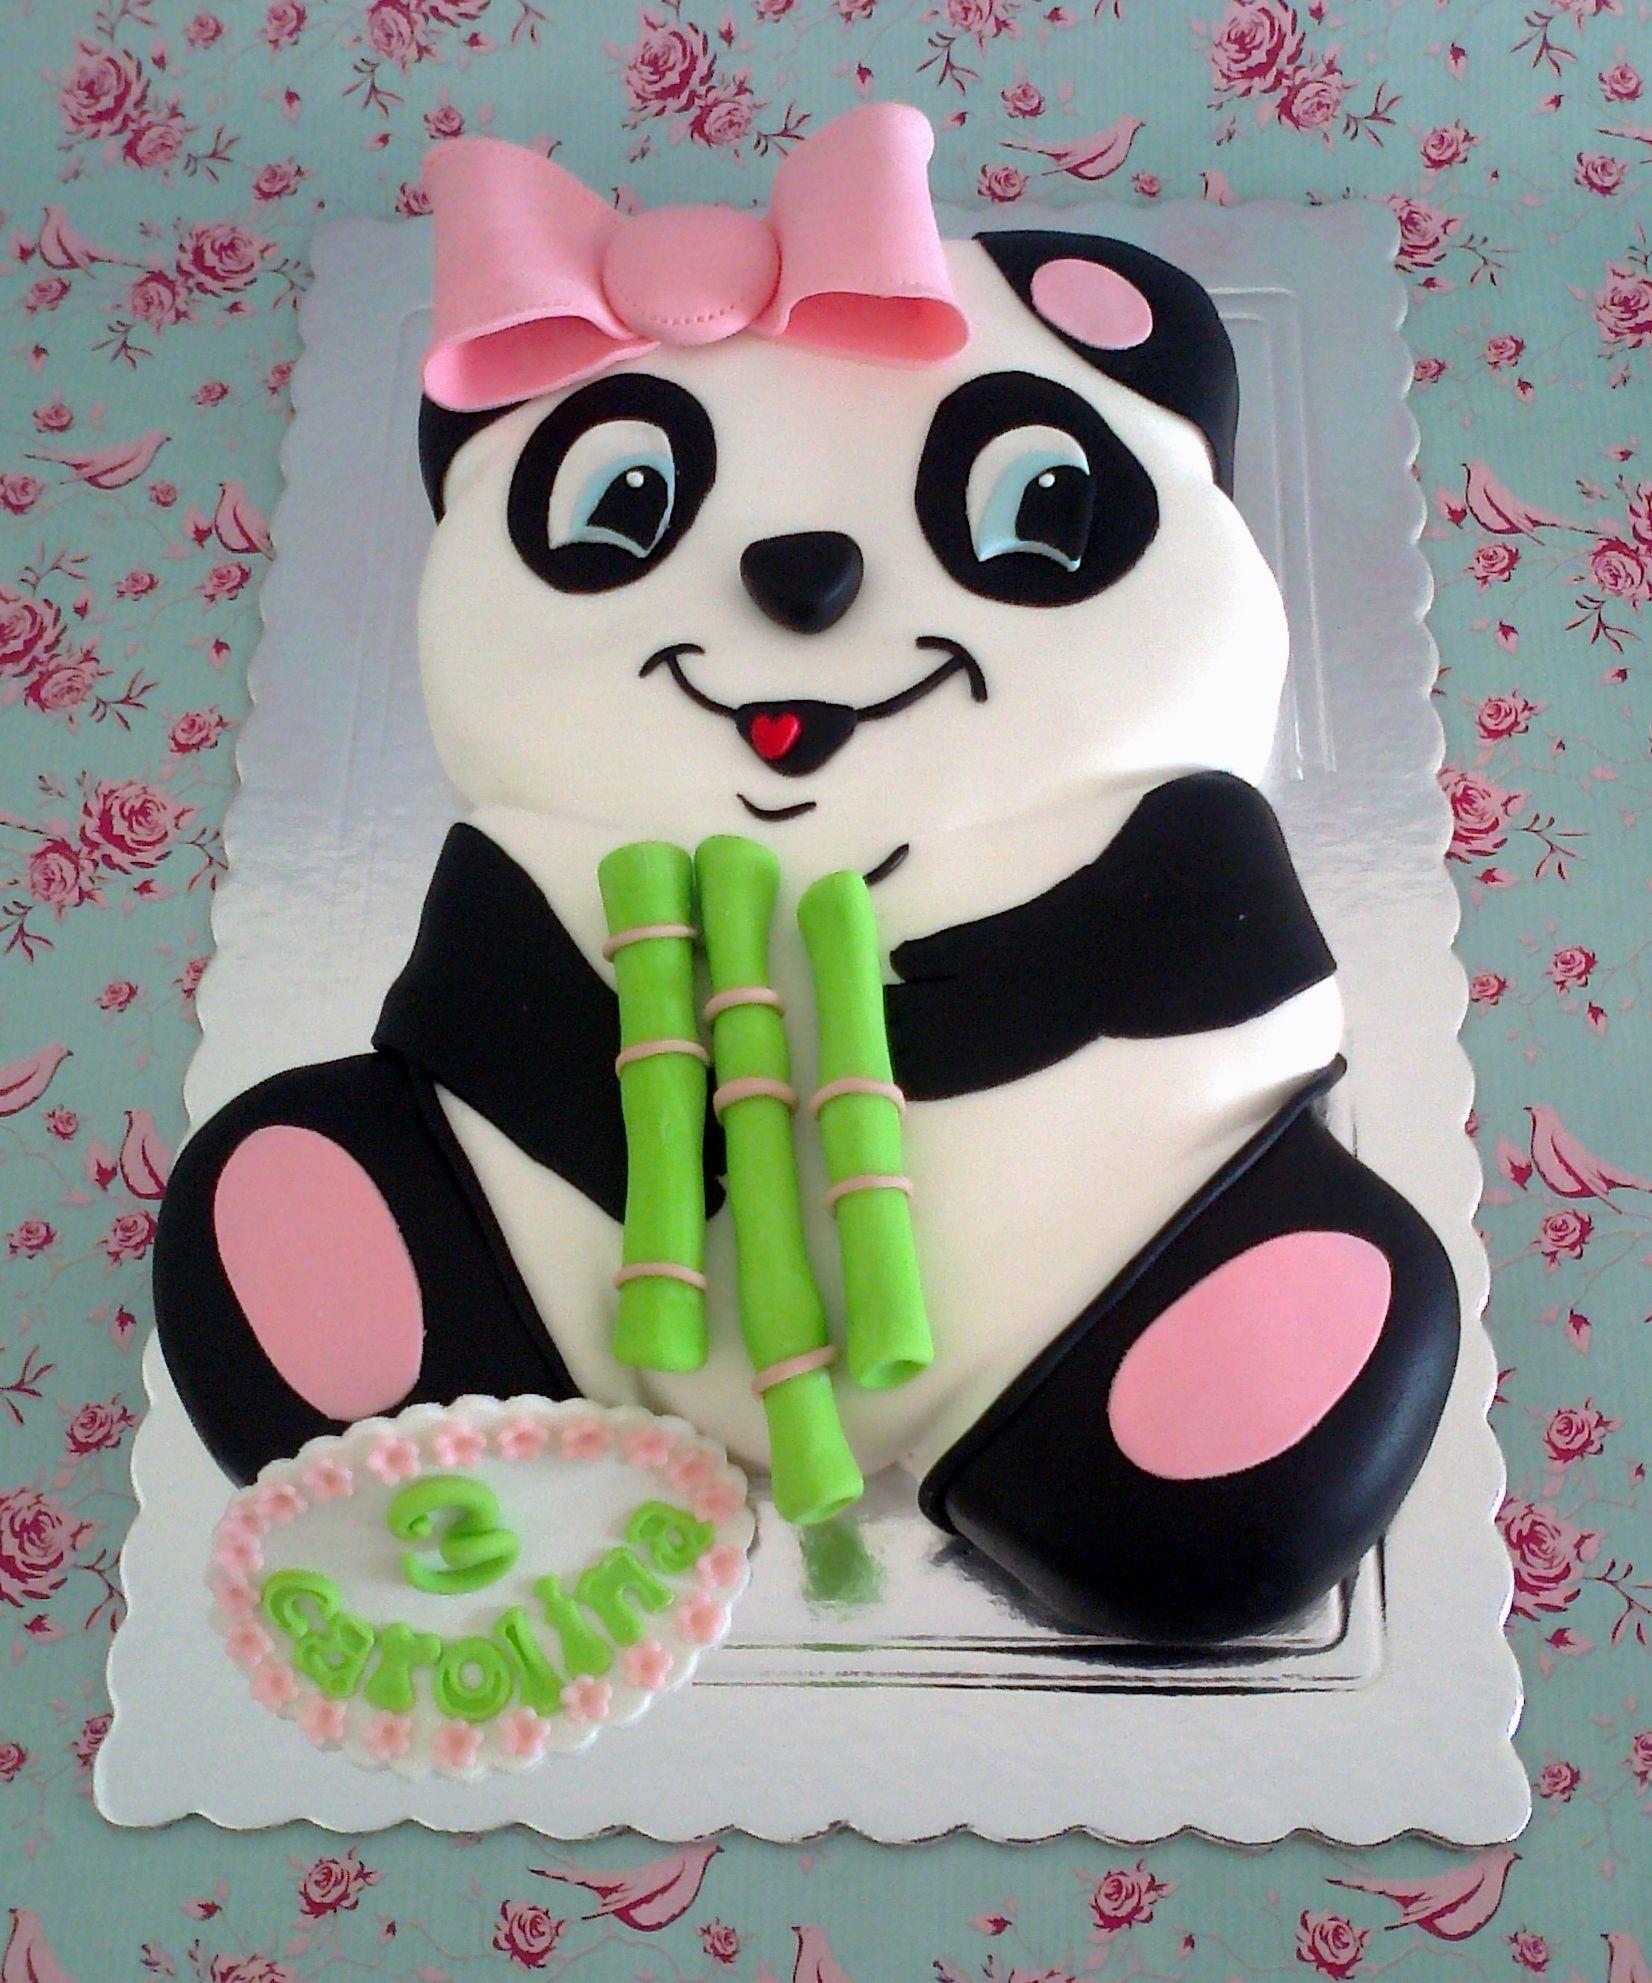 Groovy Cute Panda Birthday Cake The Cake Boutique Funny Birthday Cards Online Inifofree Goldxyz